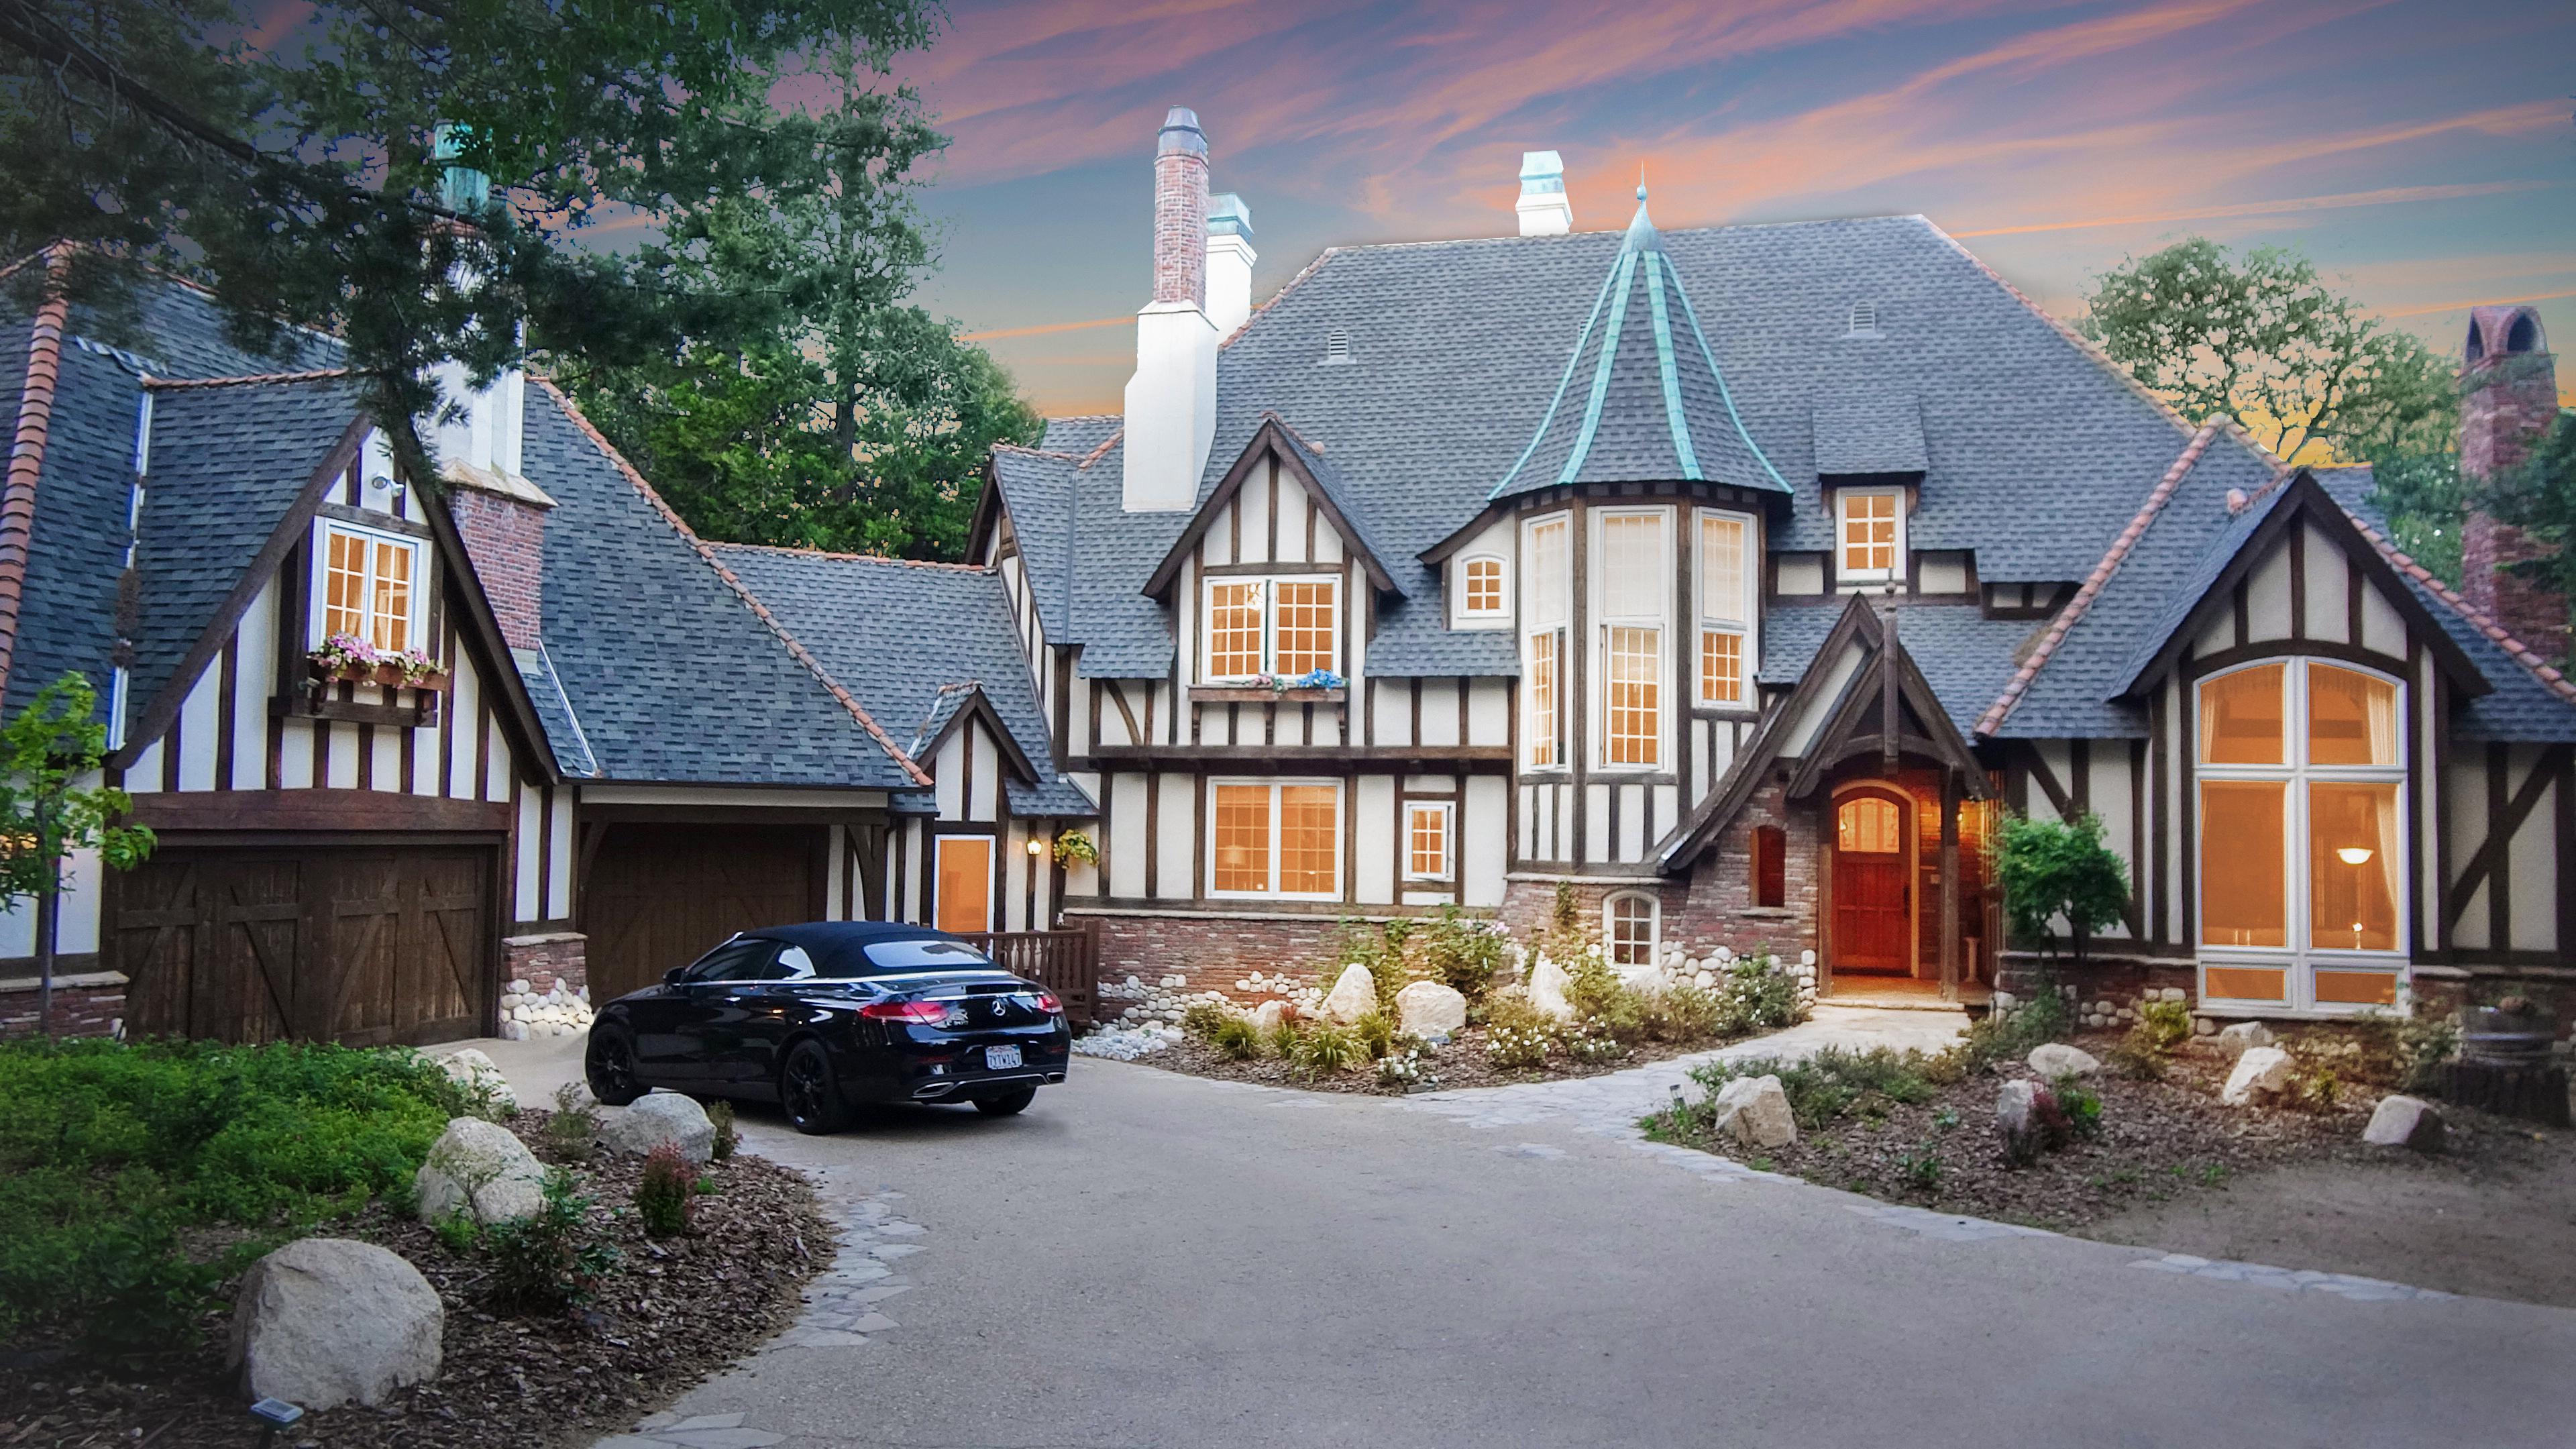 Disney Magic Home!